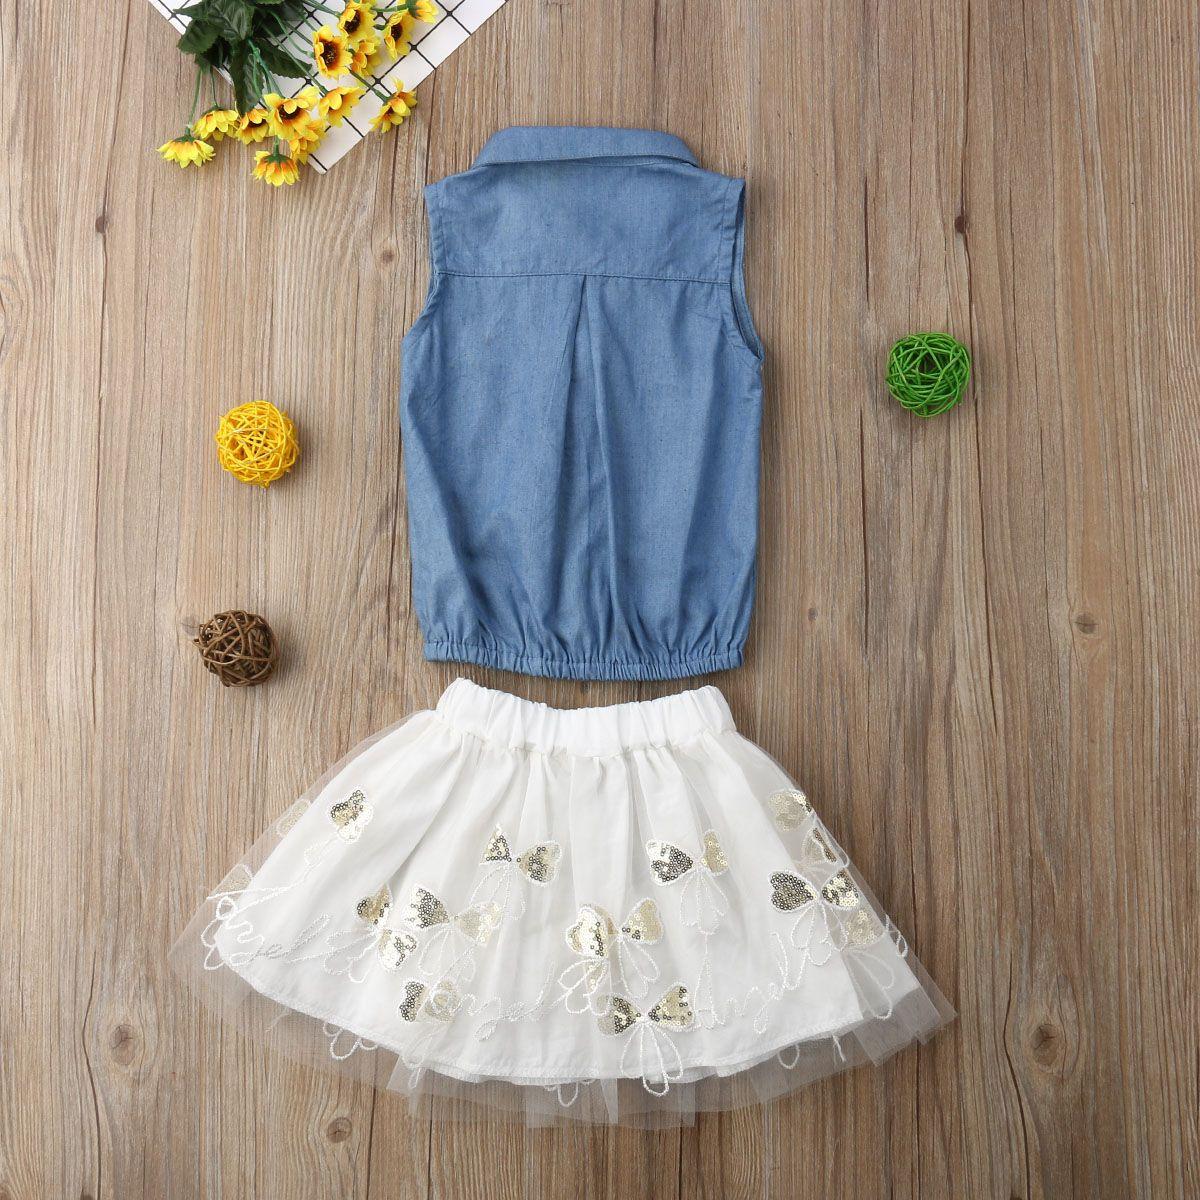 UK 2PCS Toddler Kid Girl Summer Flower Embroidery Tops+Tutu Skirt Outfit Sunsuit